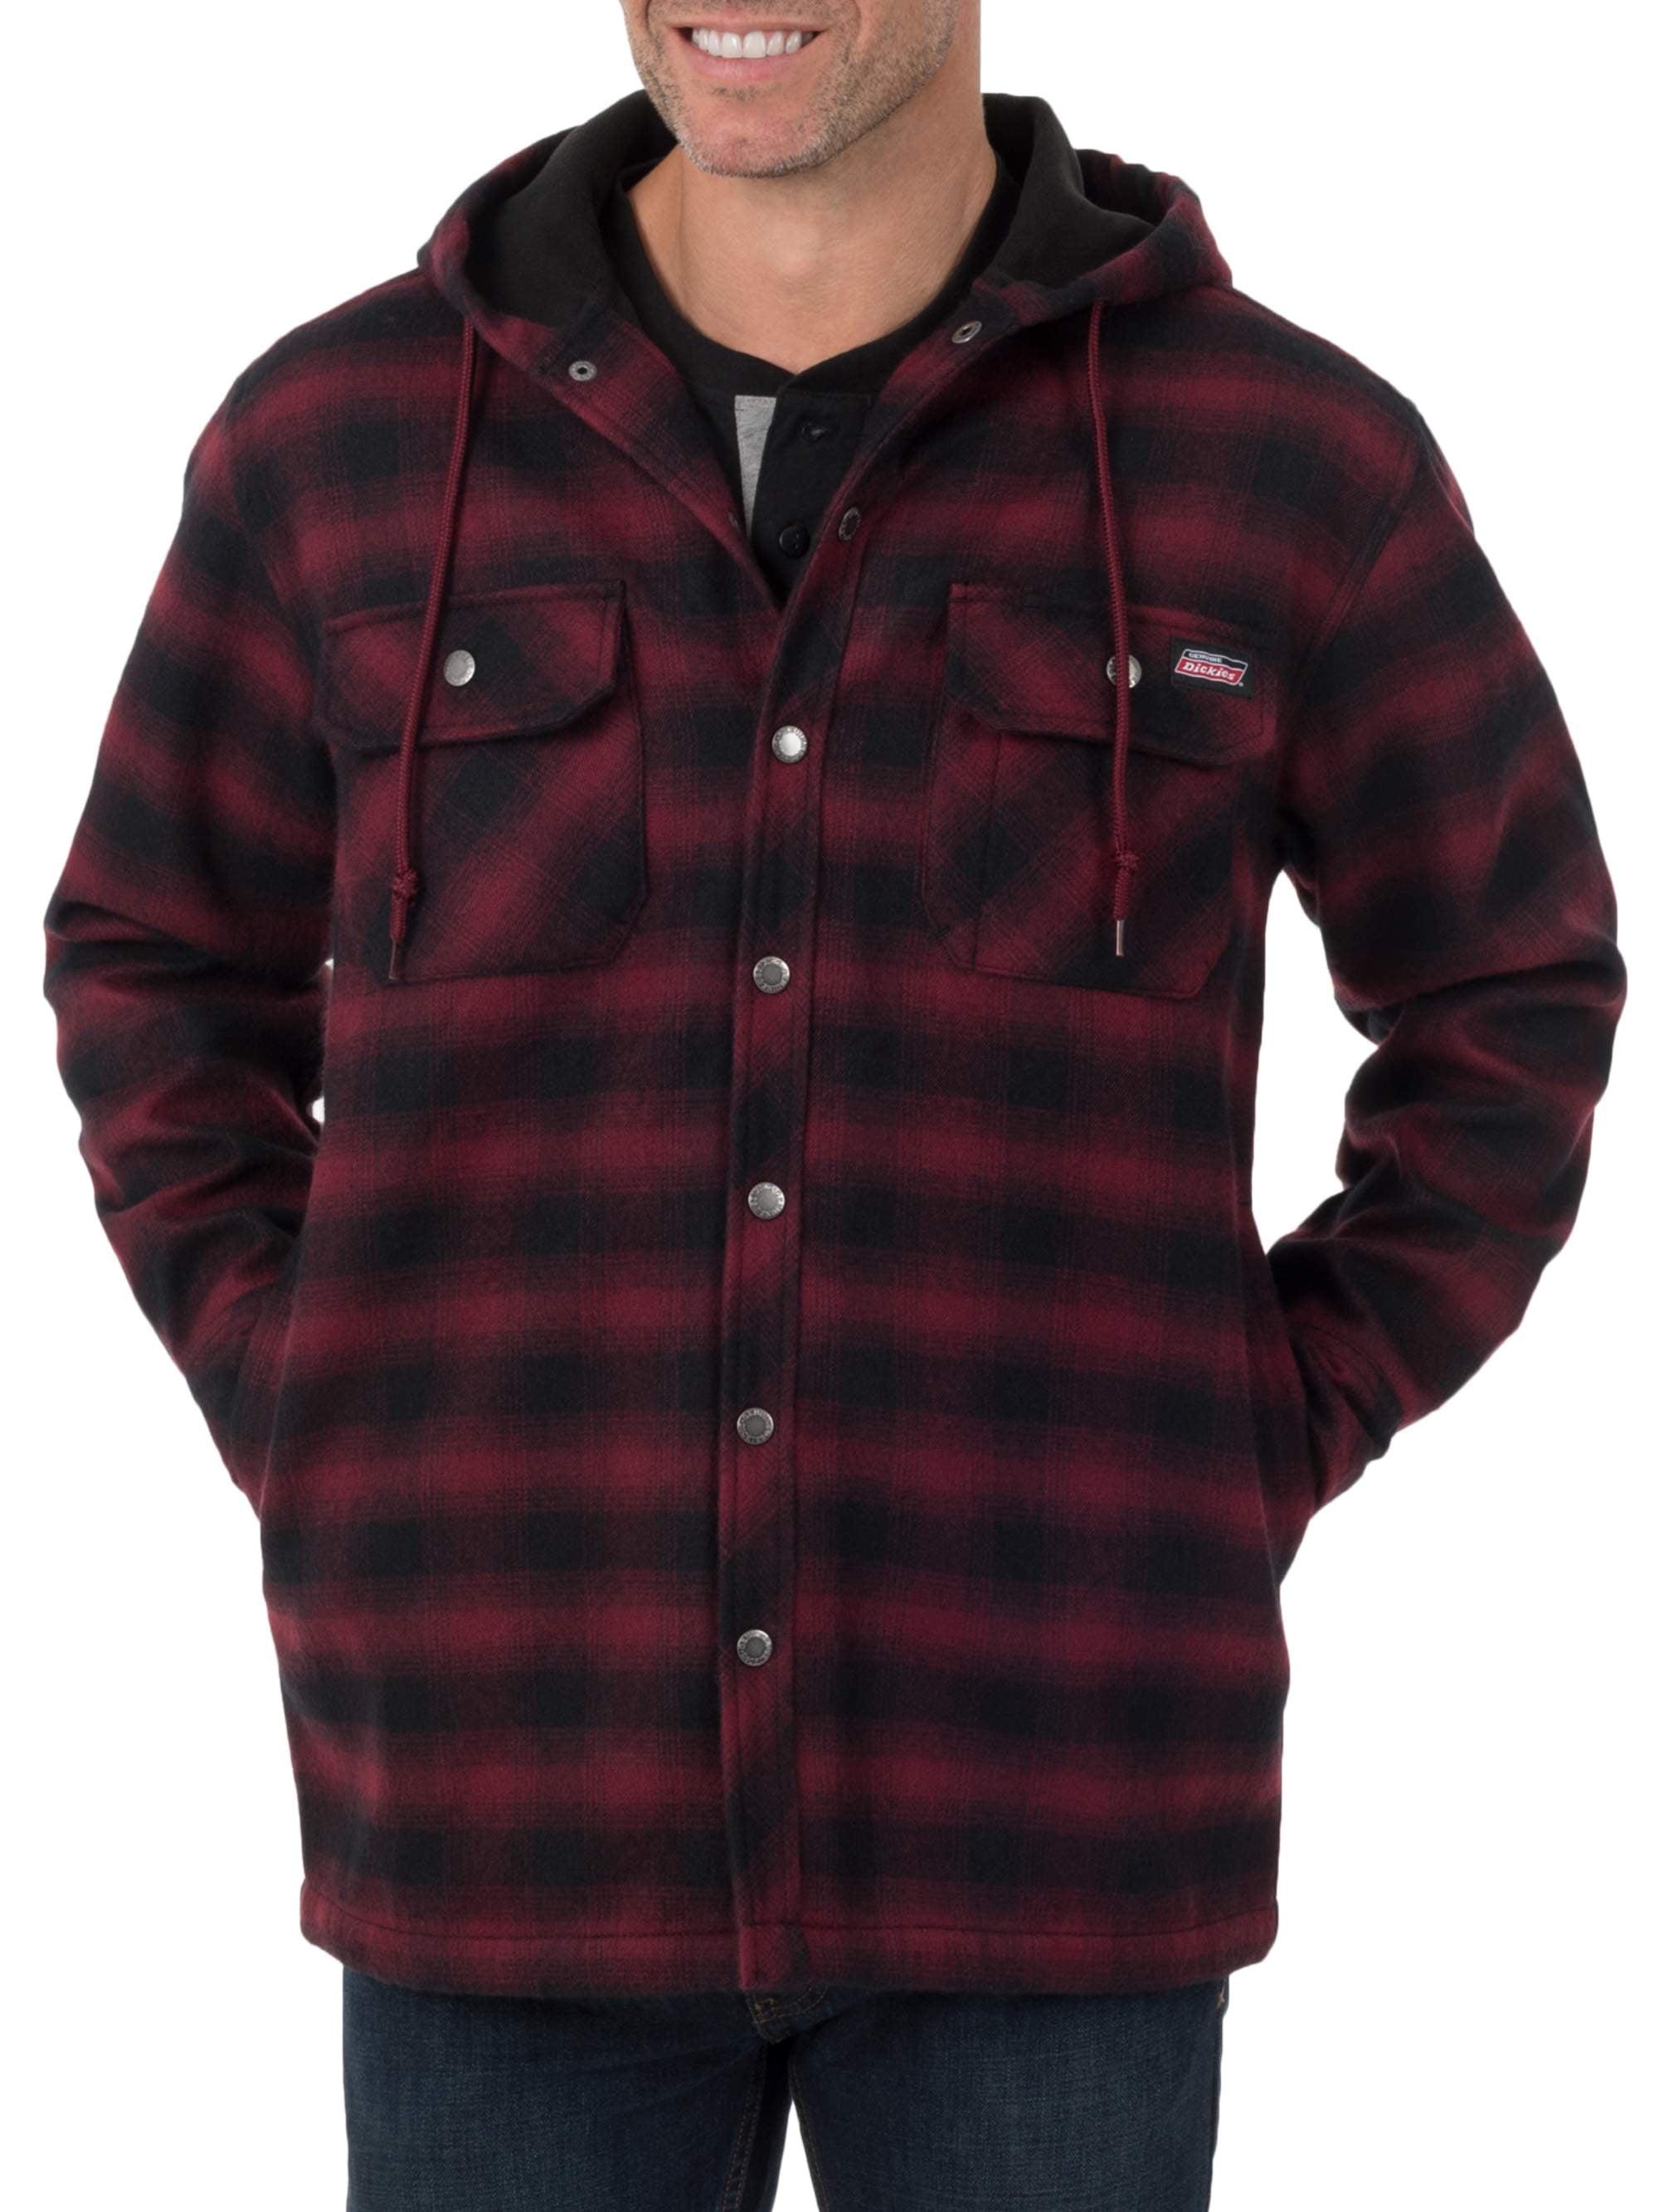 Men's Twill Polar Fleece Lined Shirt Jacket